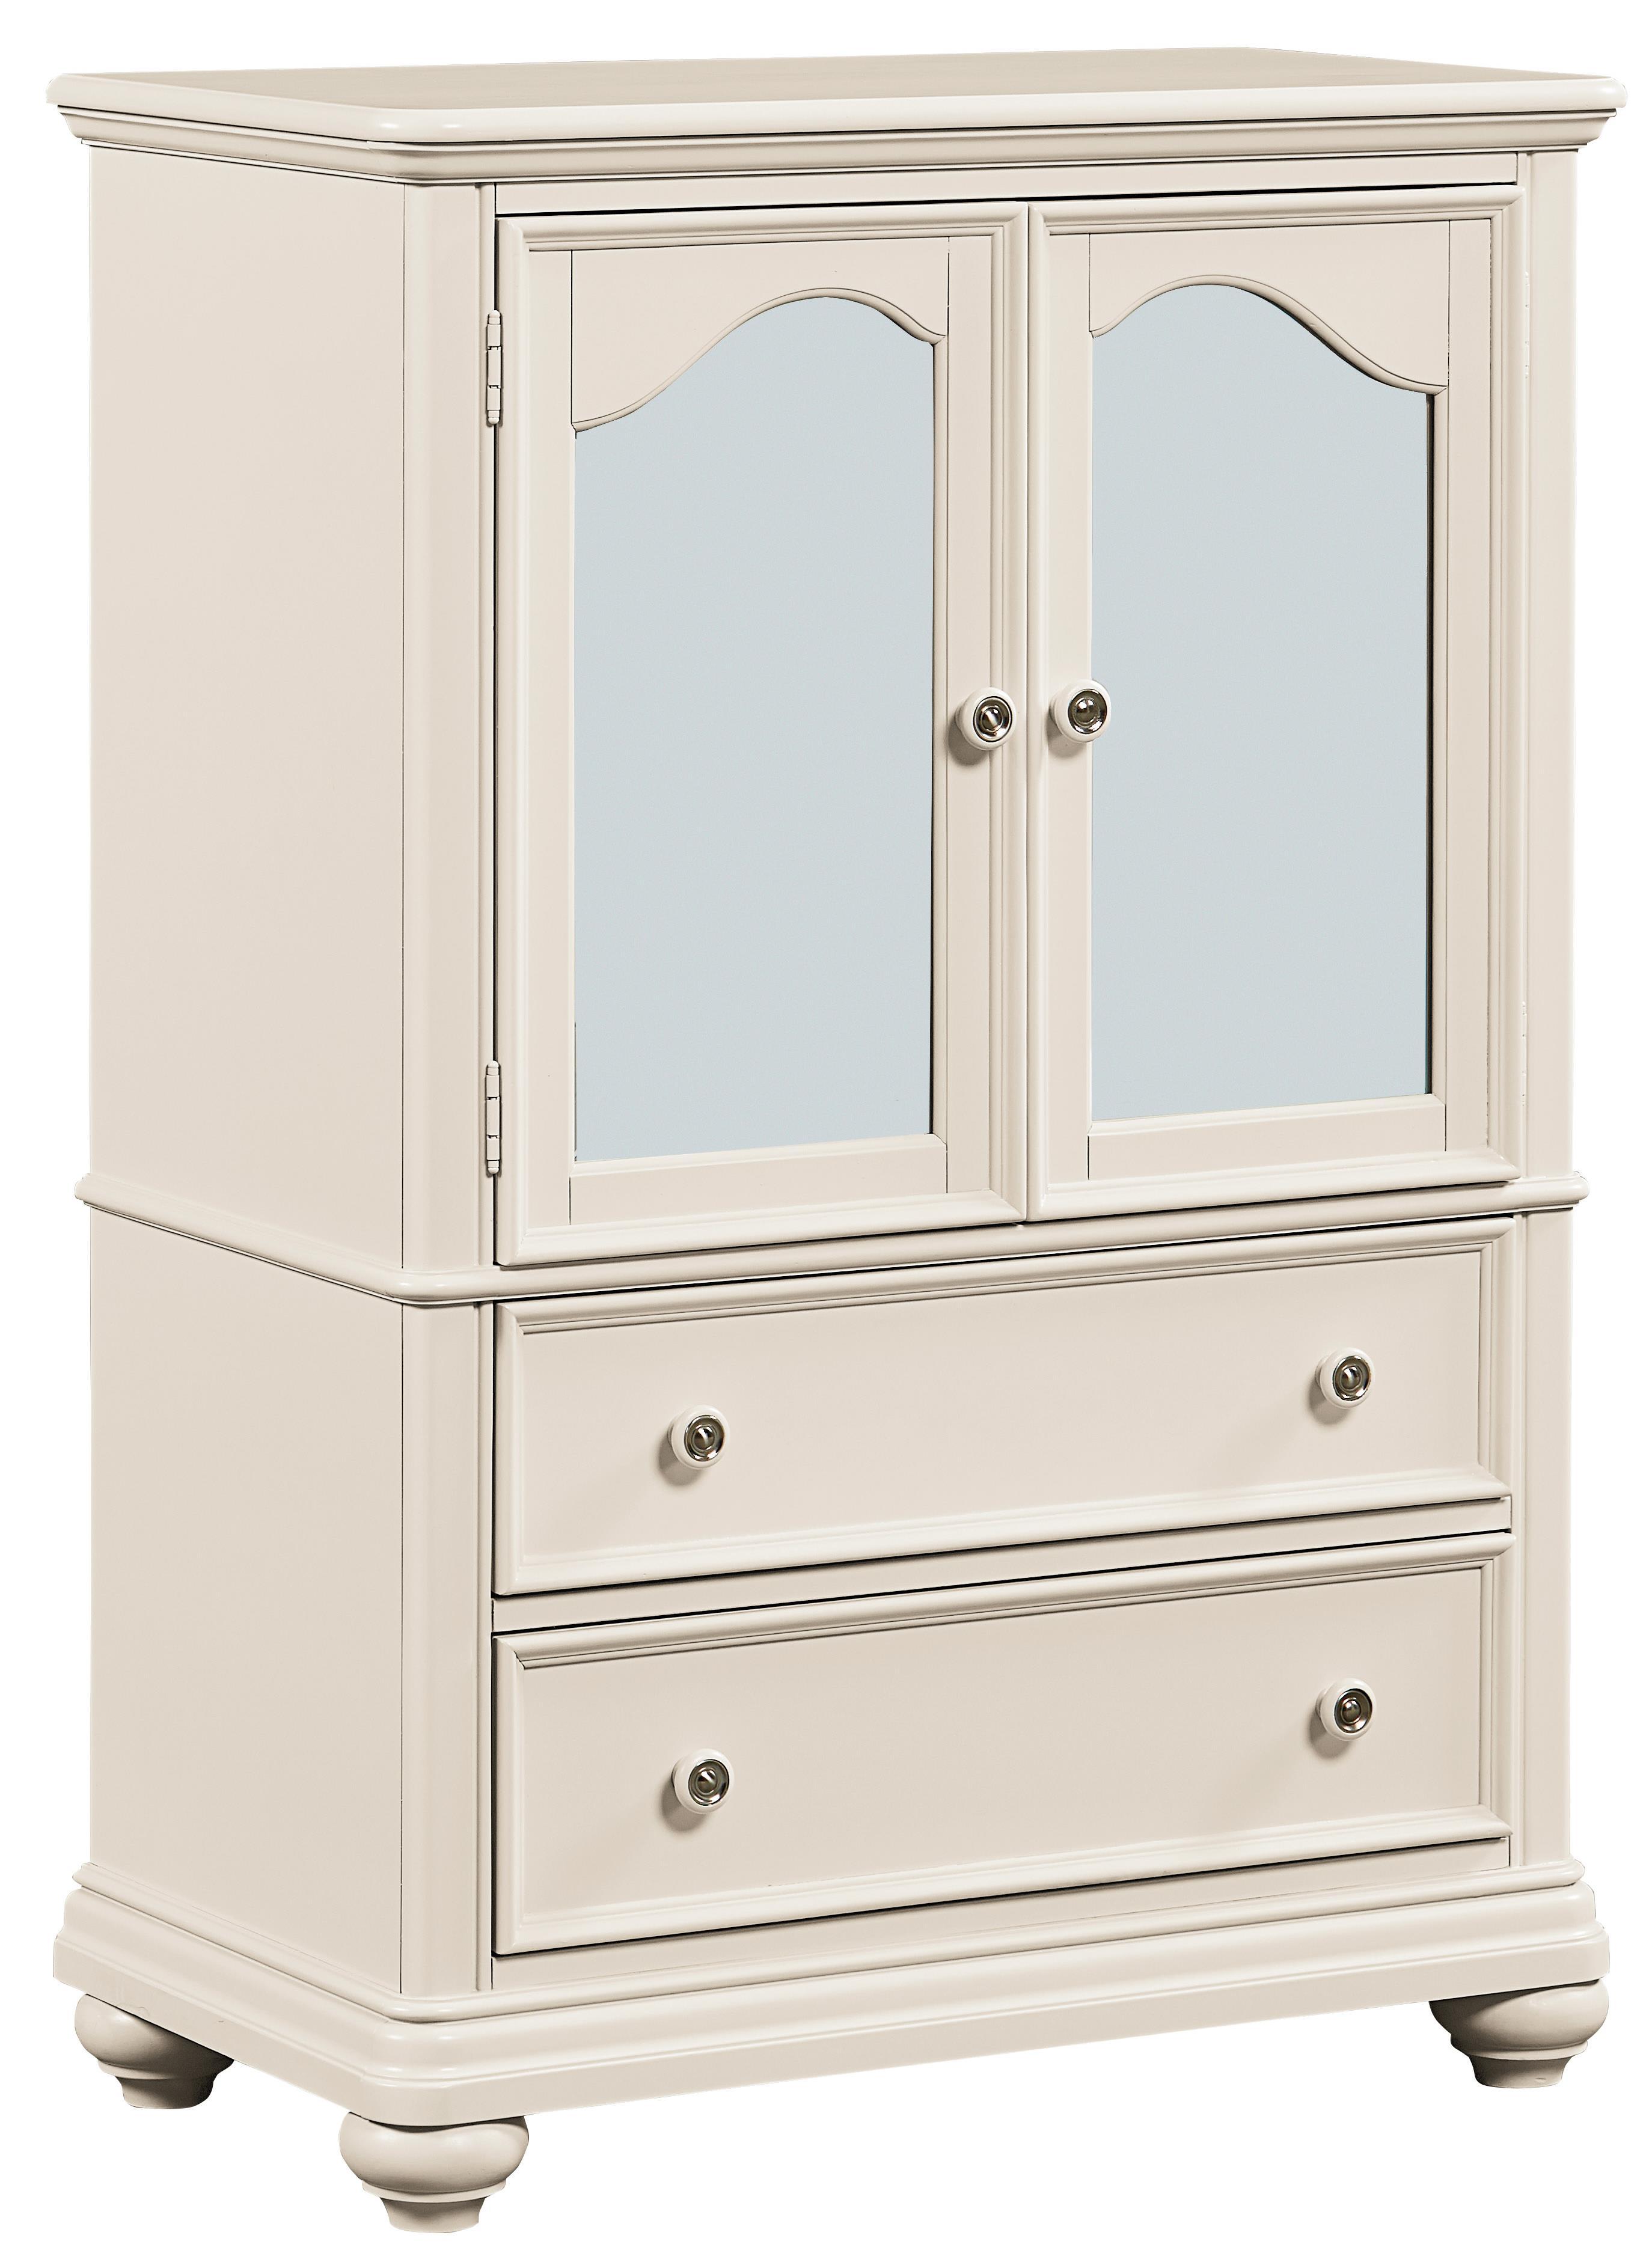 Standard Furniture Camellia Marshmallow Youth Wardrobe                - Item Number: 95210